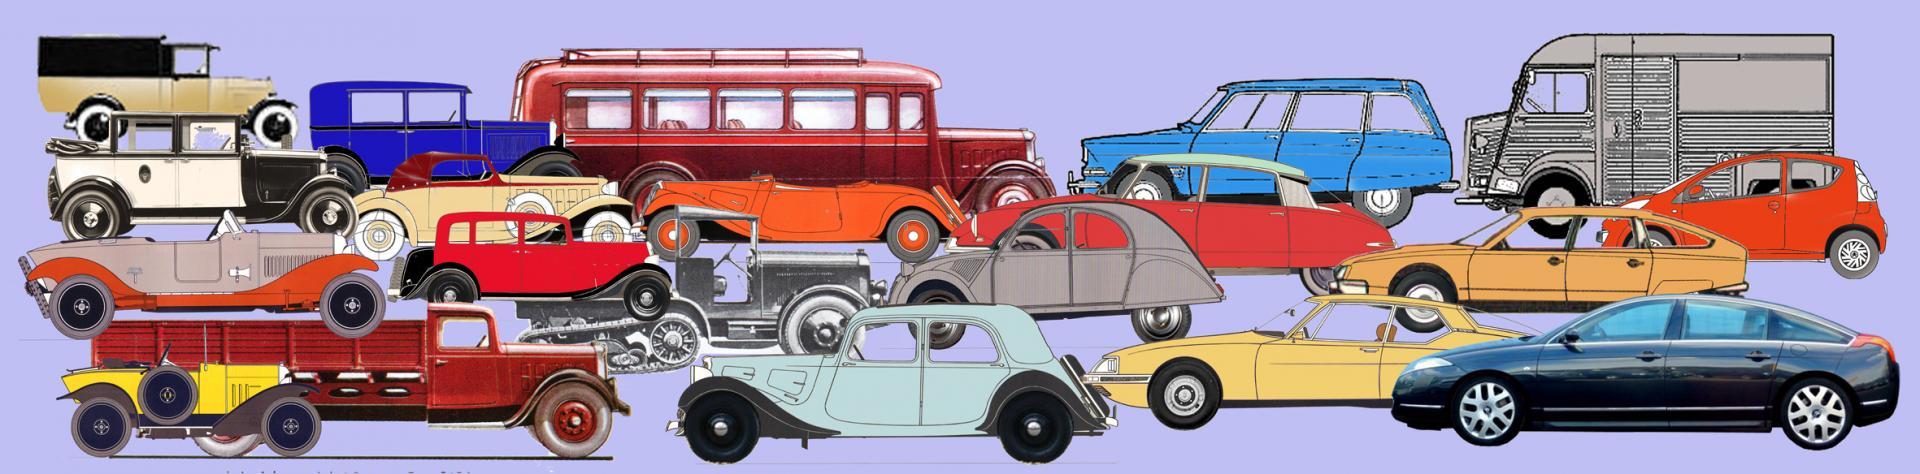 Fresque tous vehicules petite